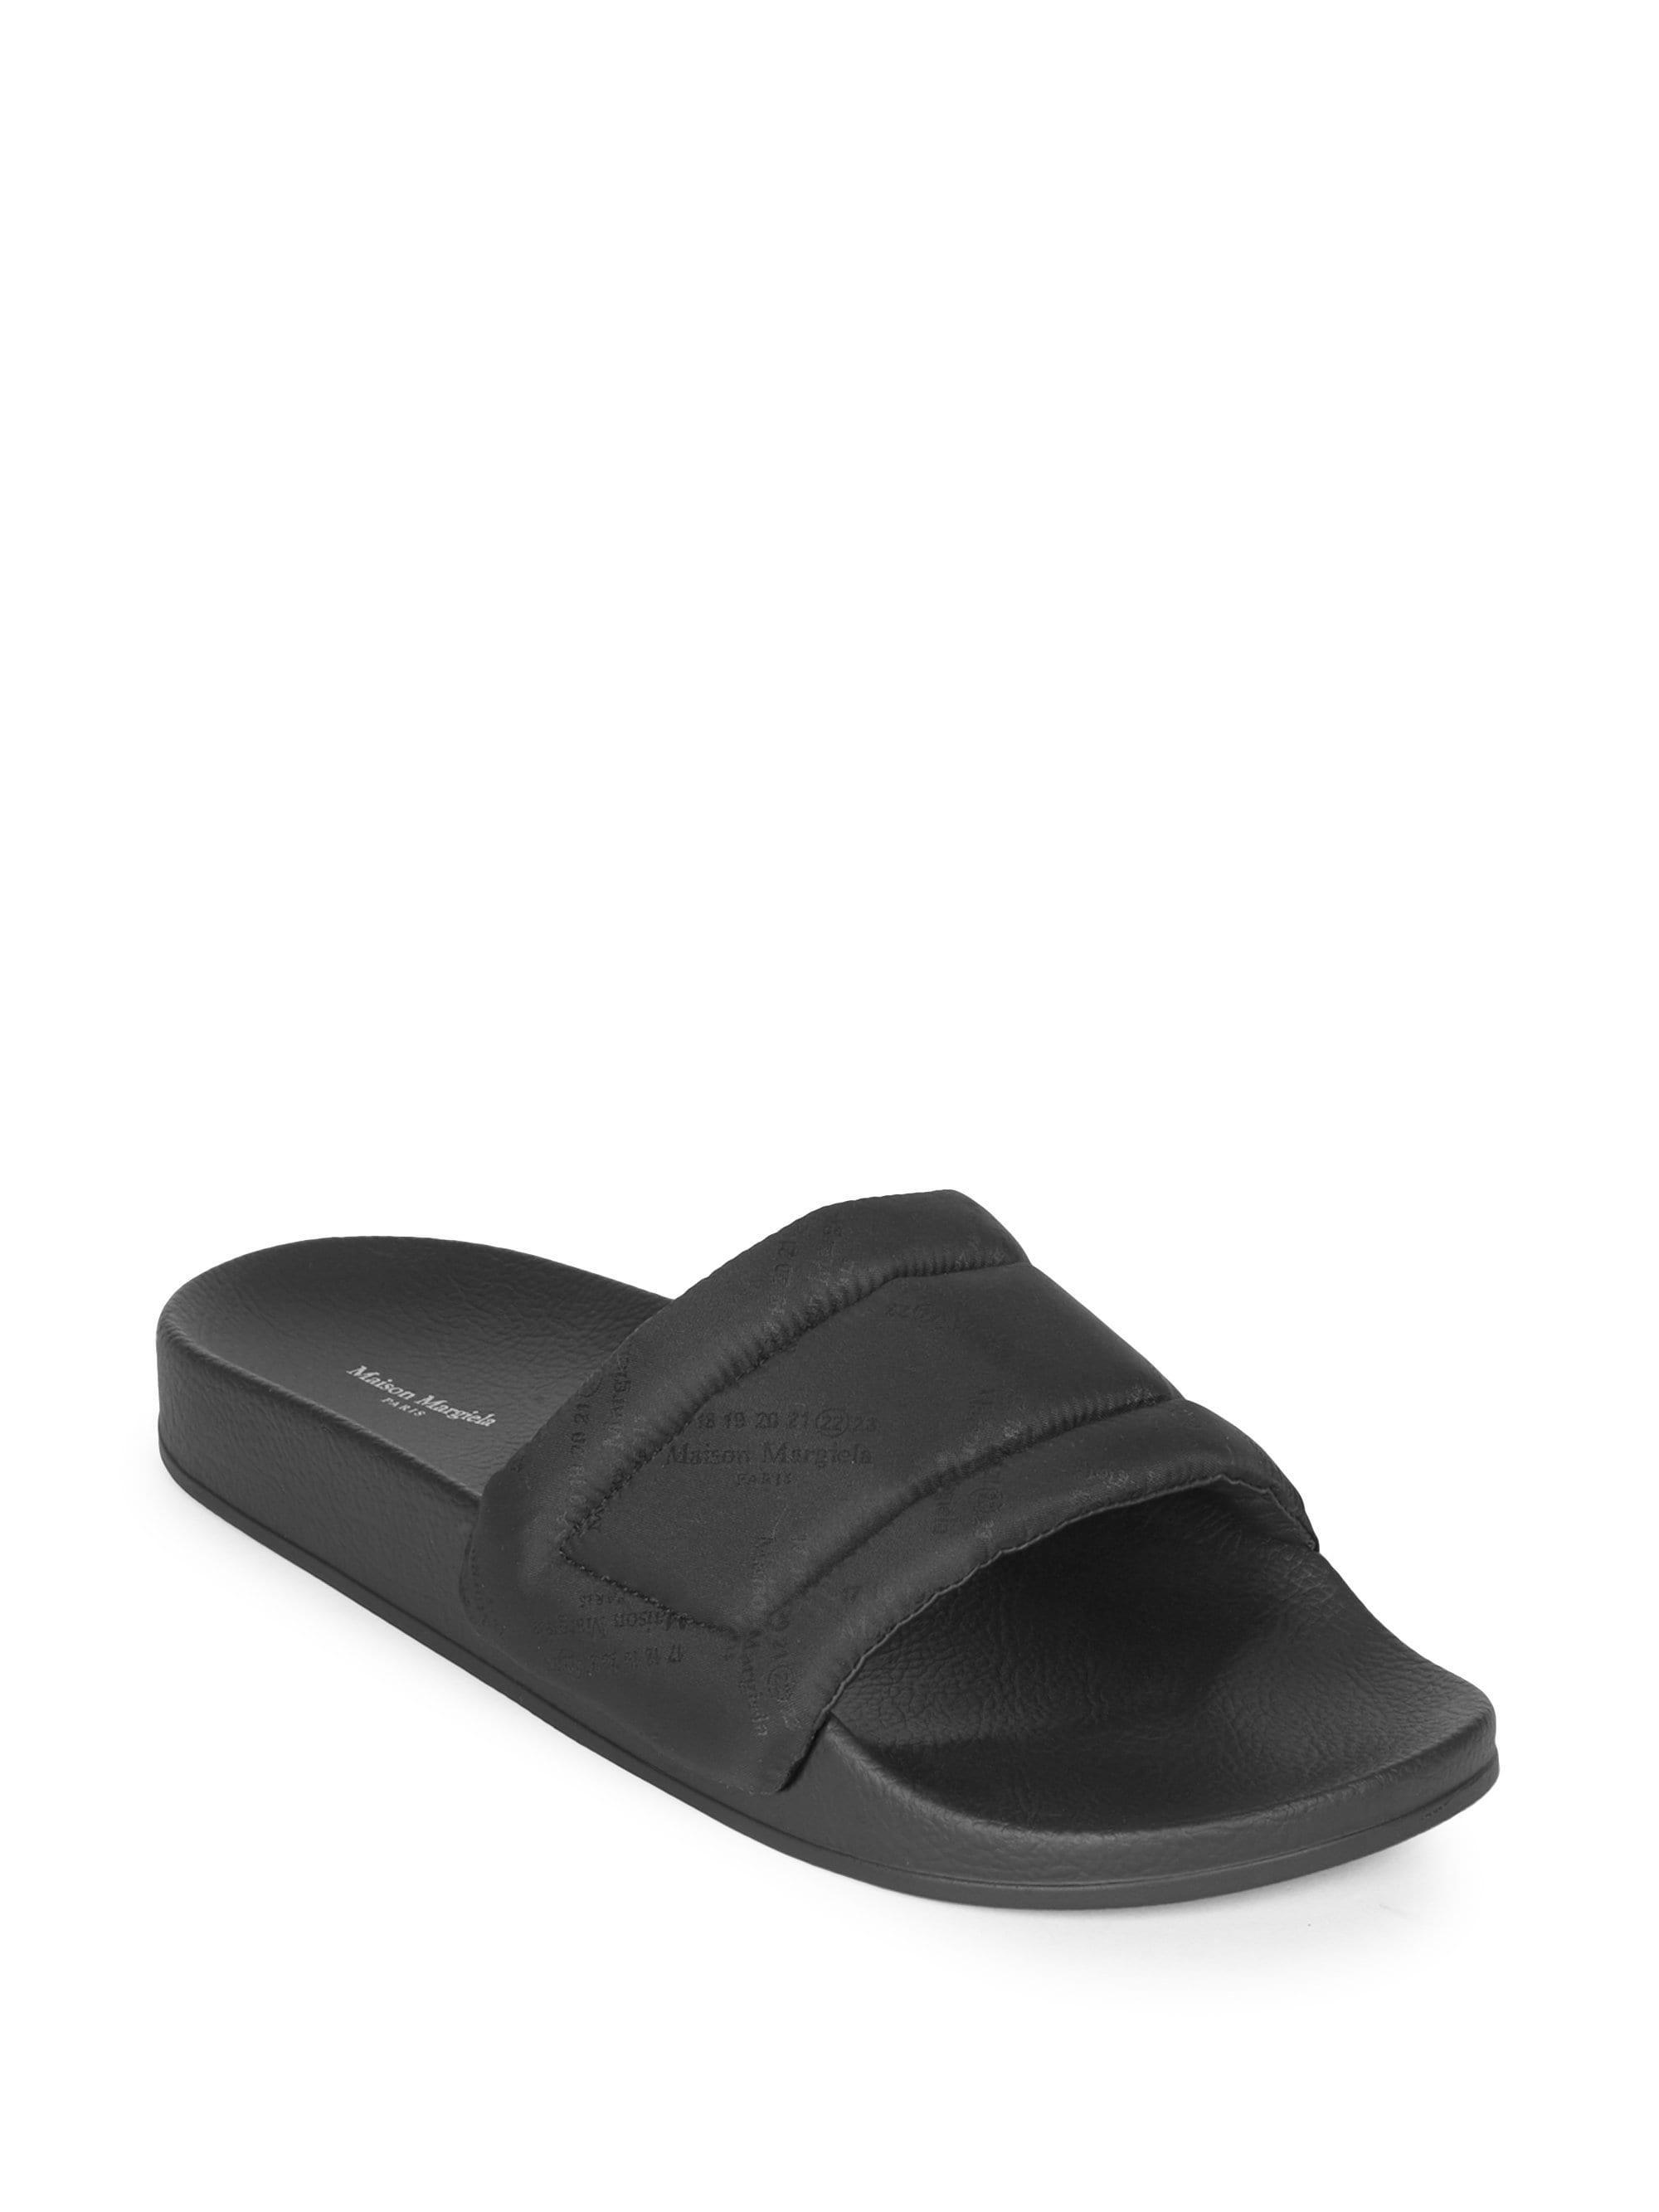 3ffae9d341202 ... Men s Future Logo Rubber Slides - Black - Size 45 (12). View fullscreen